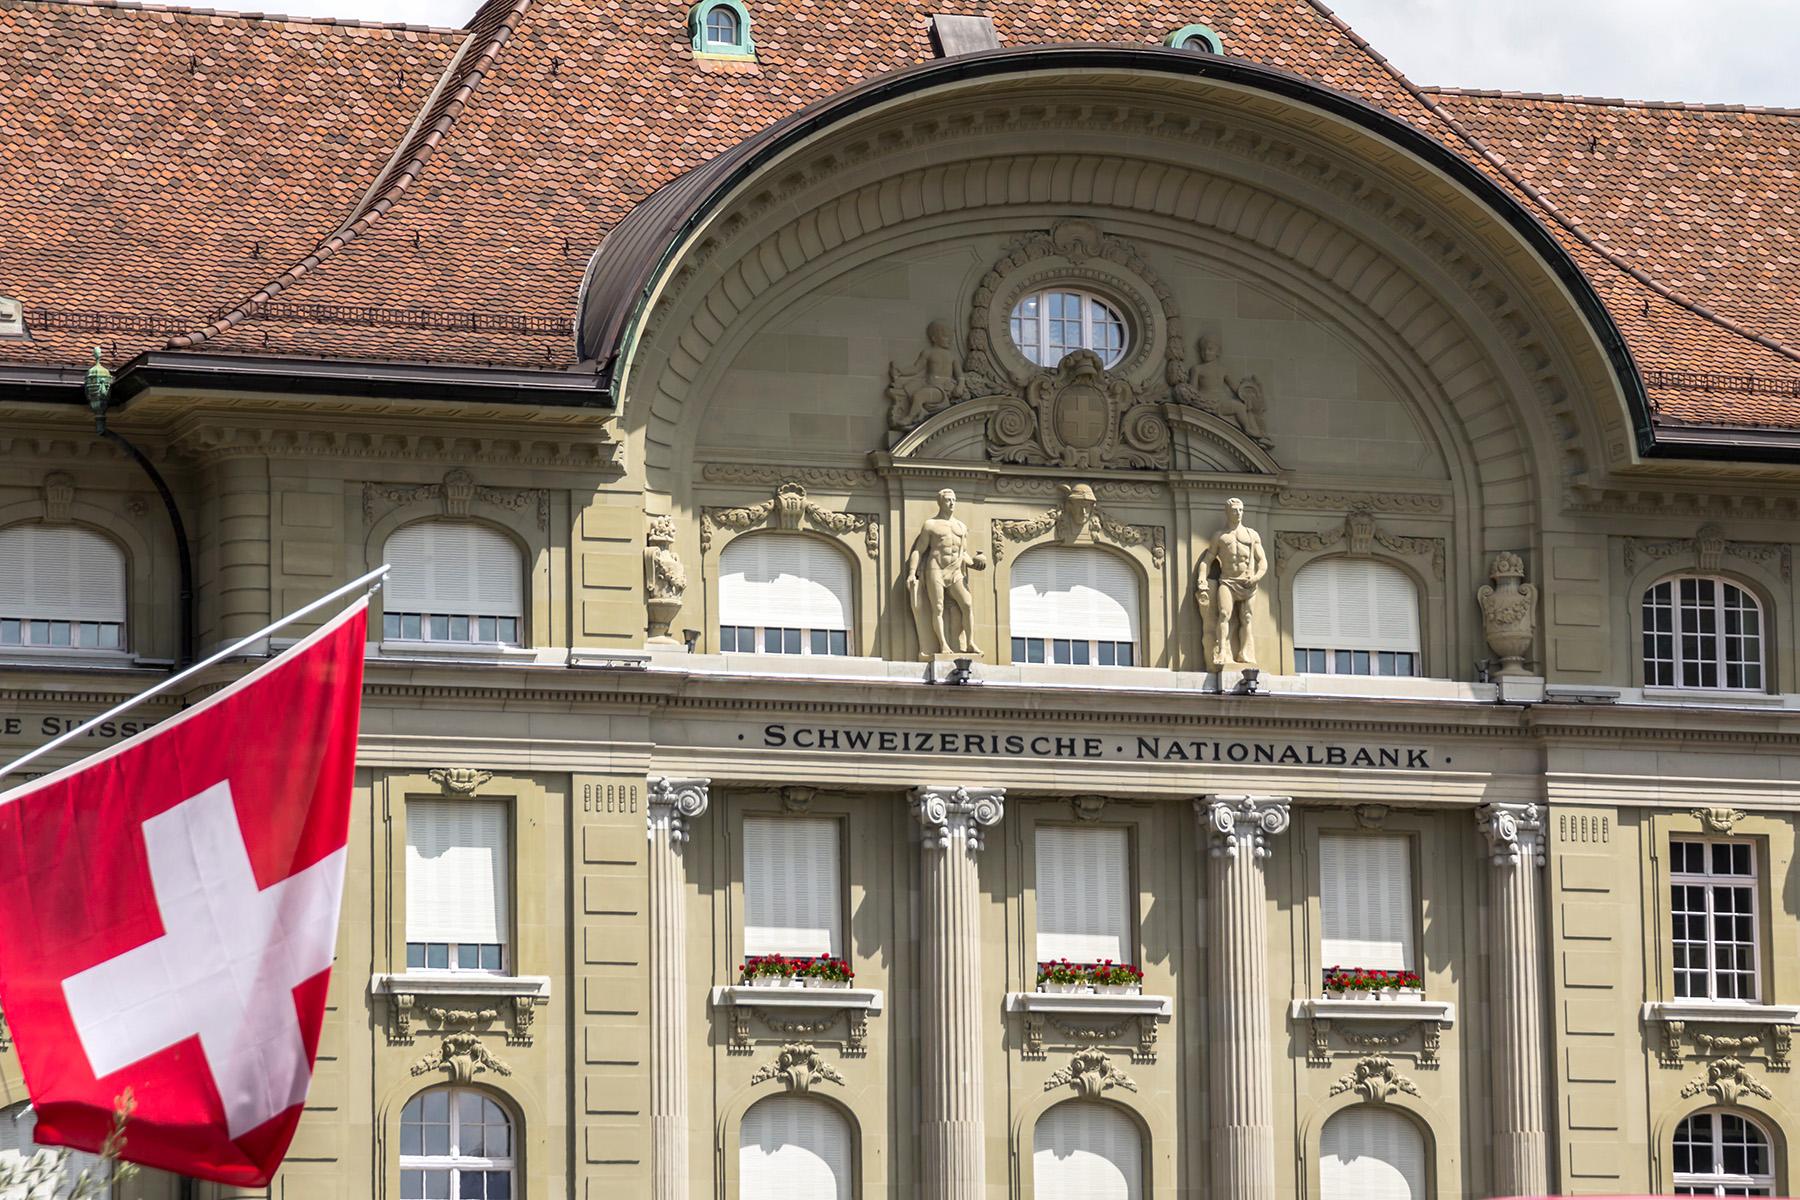 Switzerland National Bank building